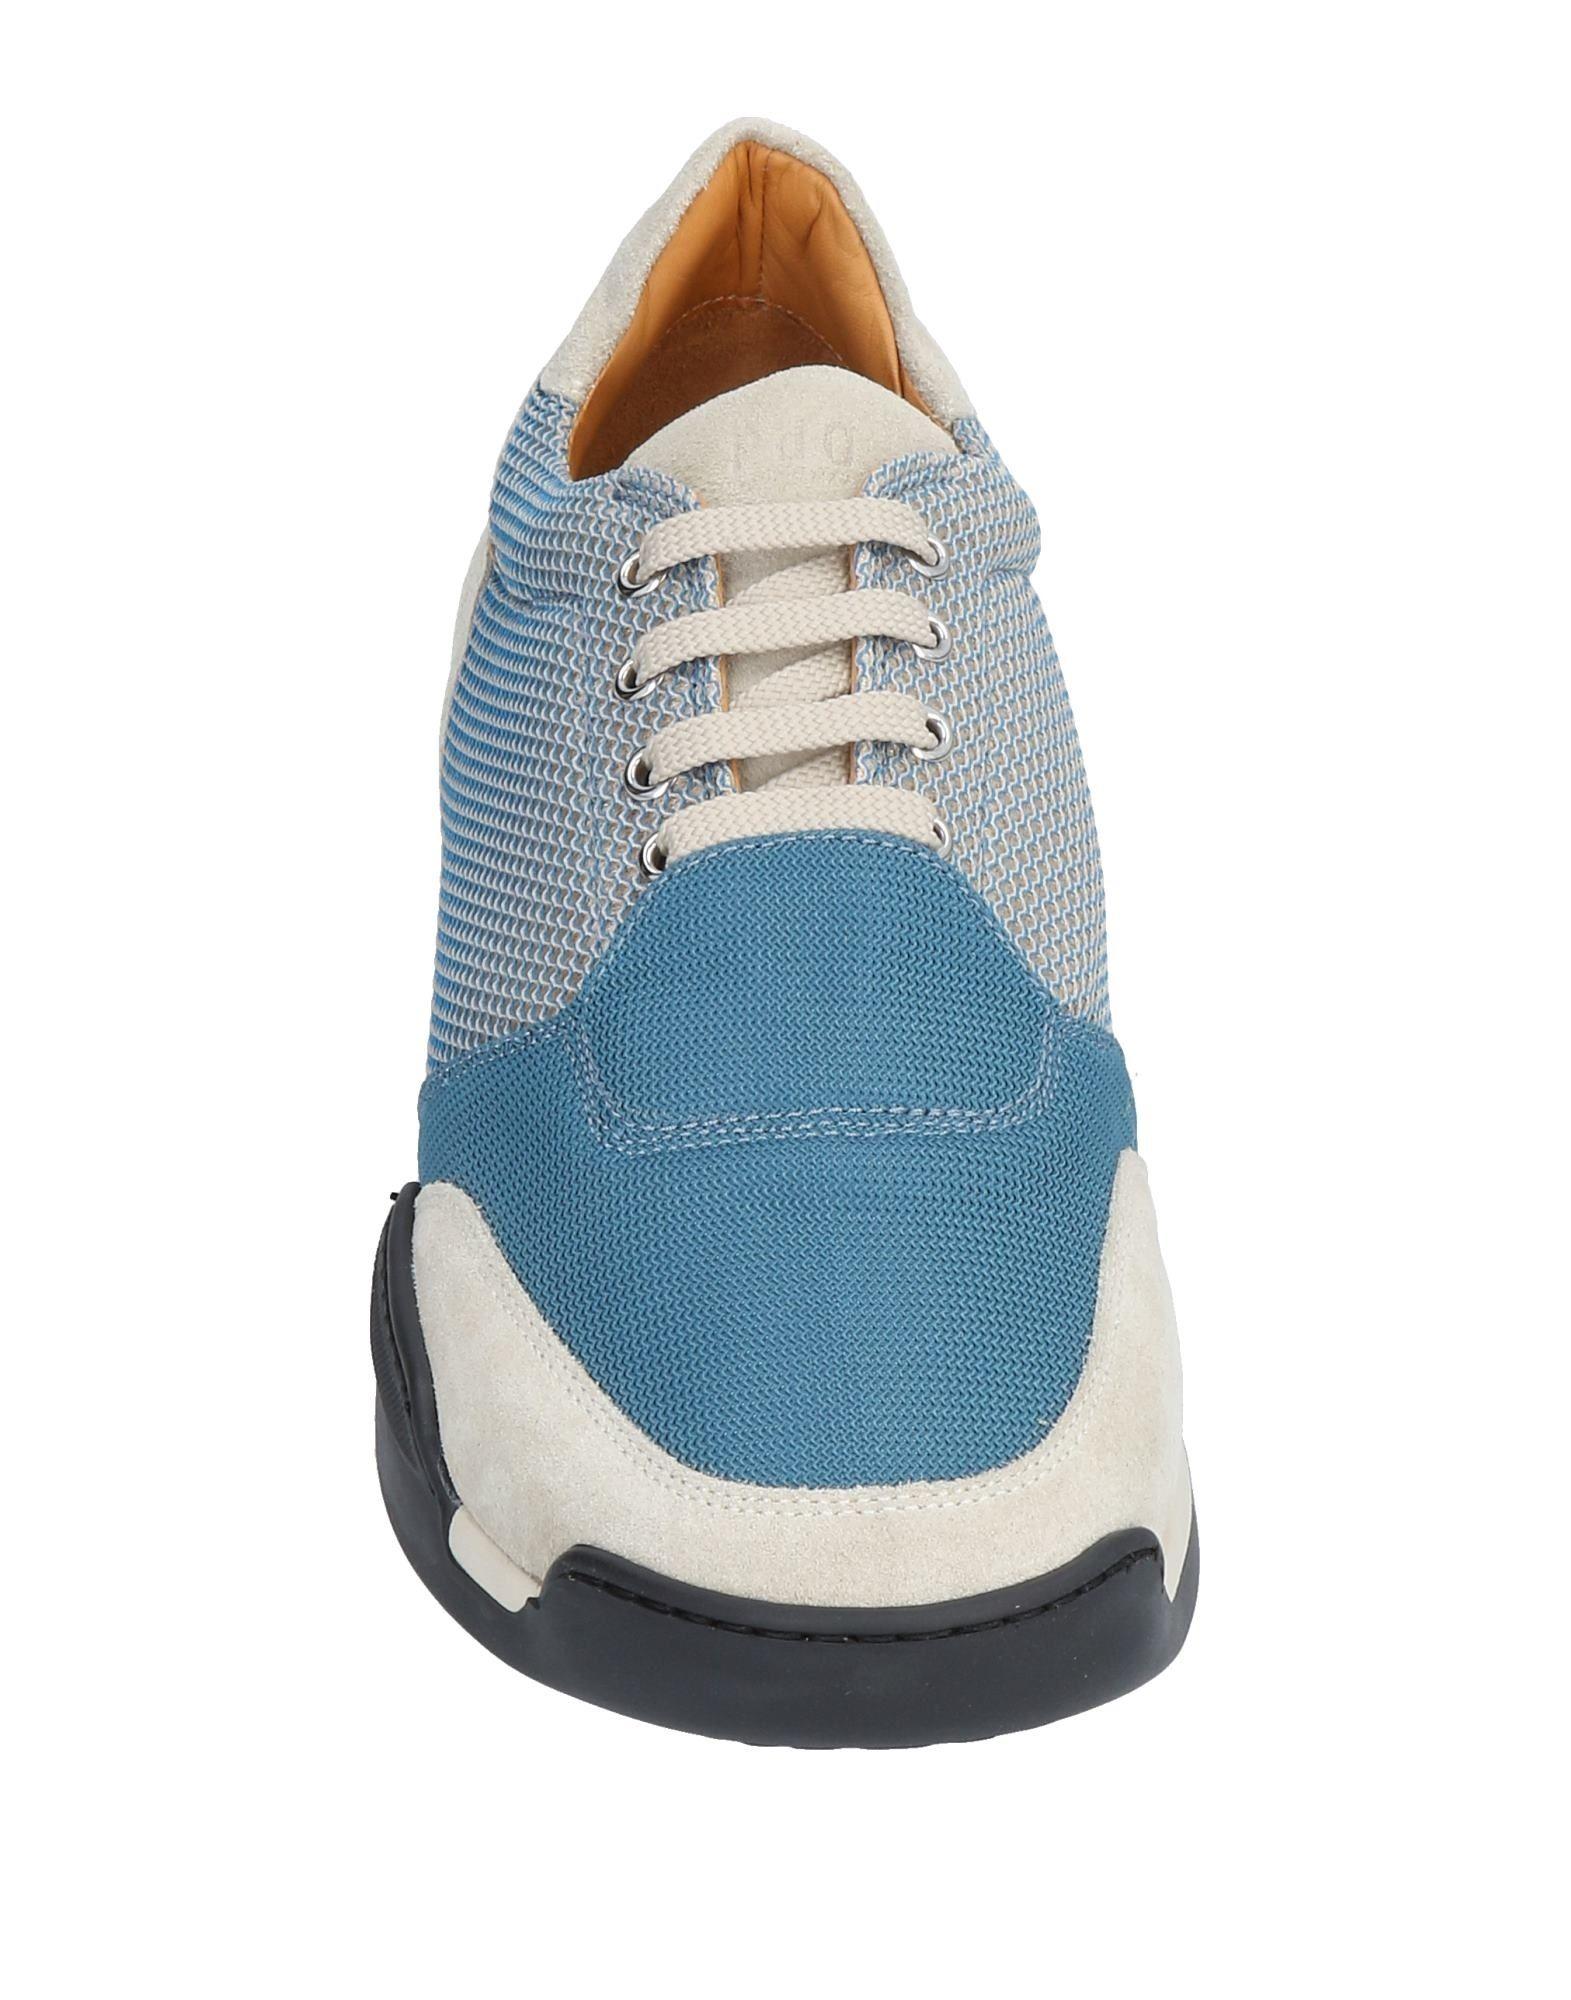 Pantofola D'oro  Sneakers Herren  D'oro 11222104SM Neue Schuhe 2f605a